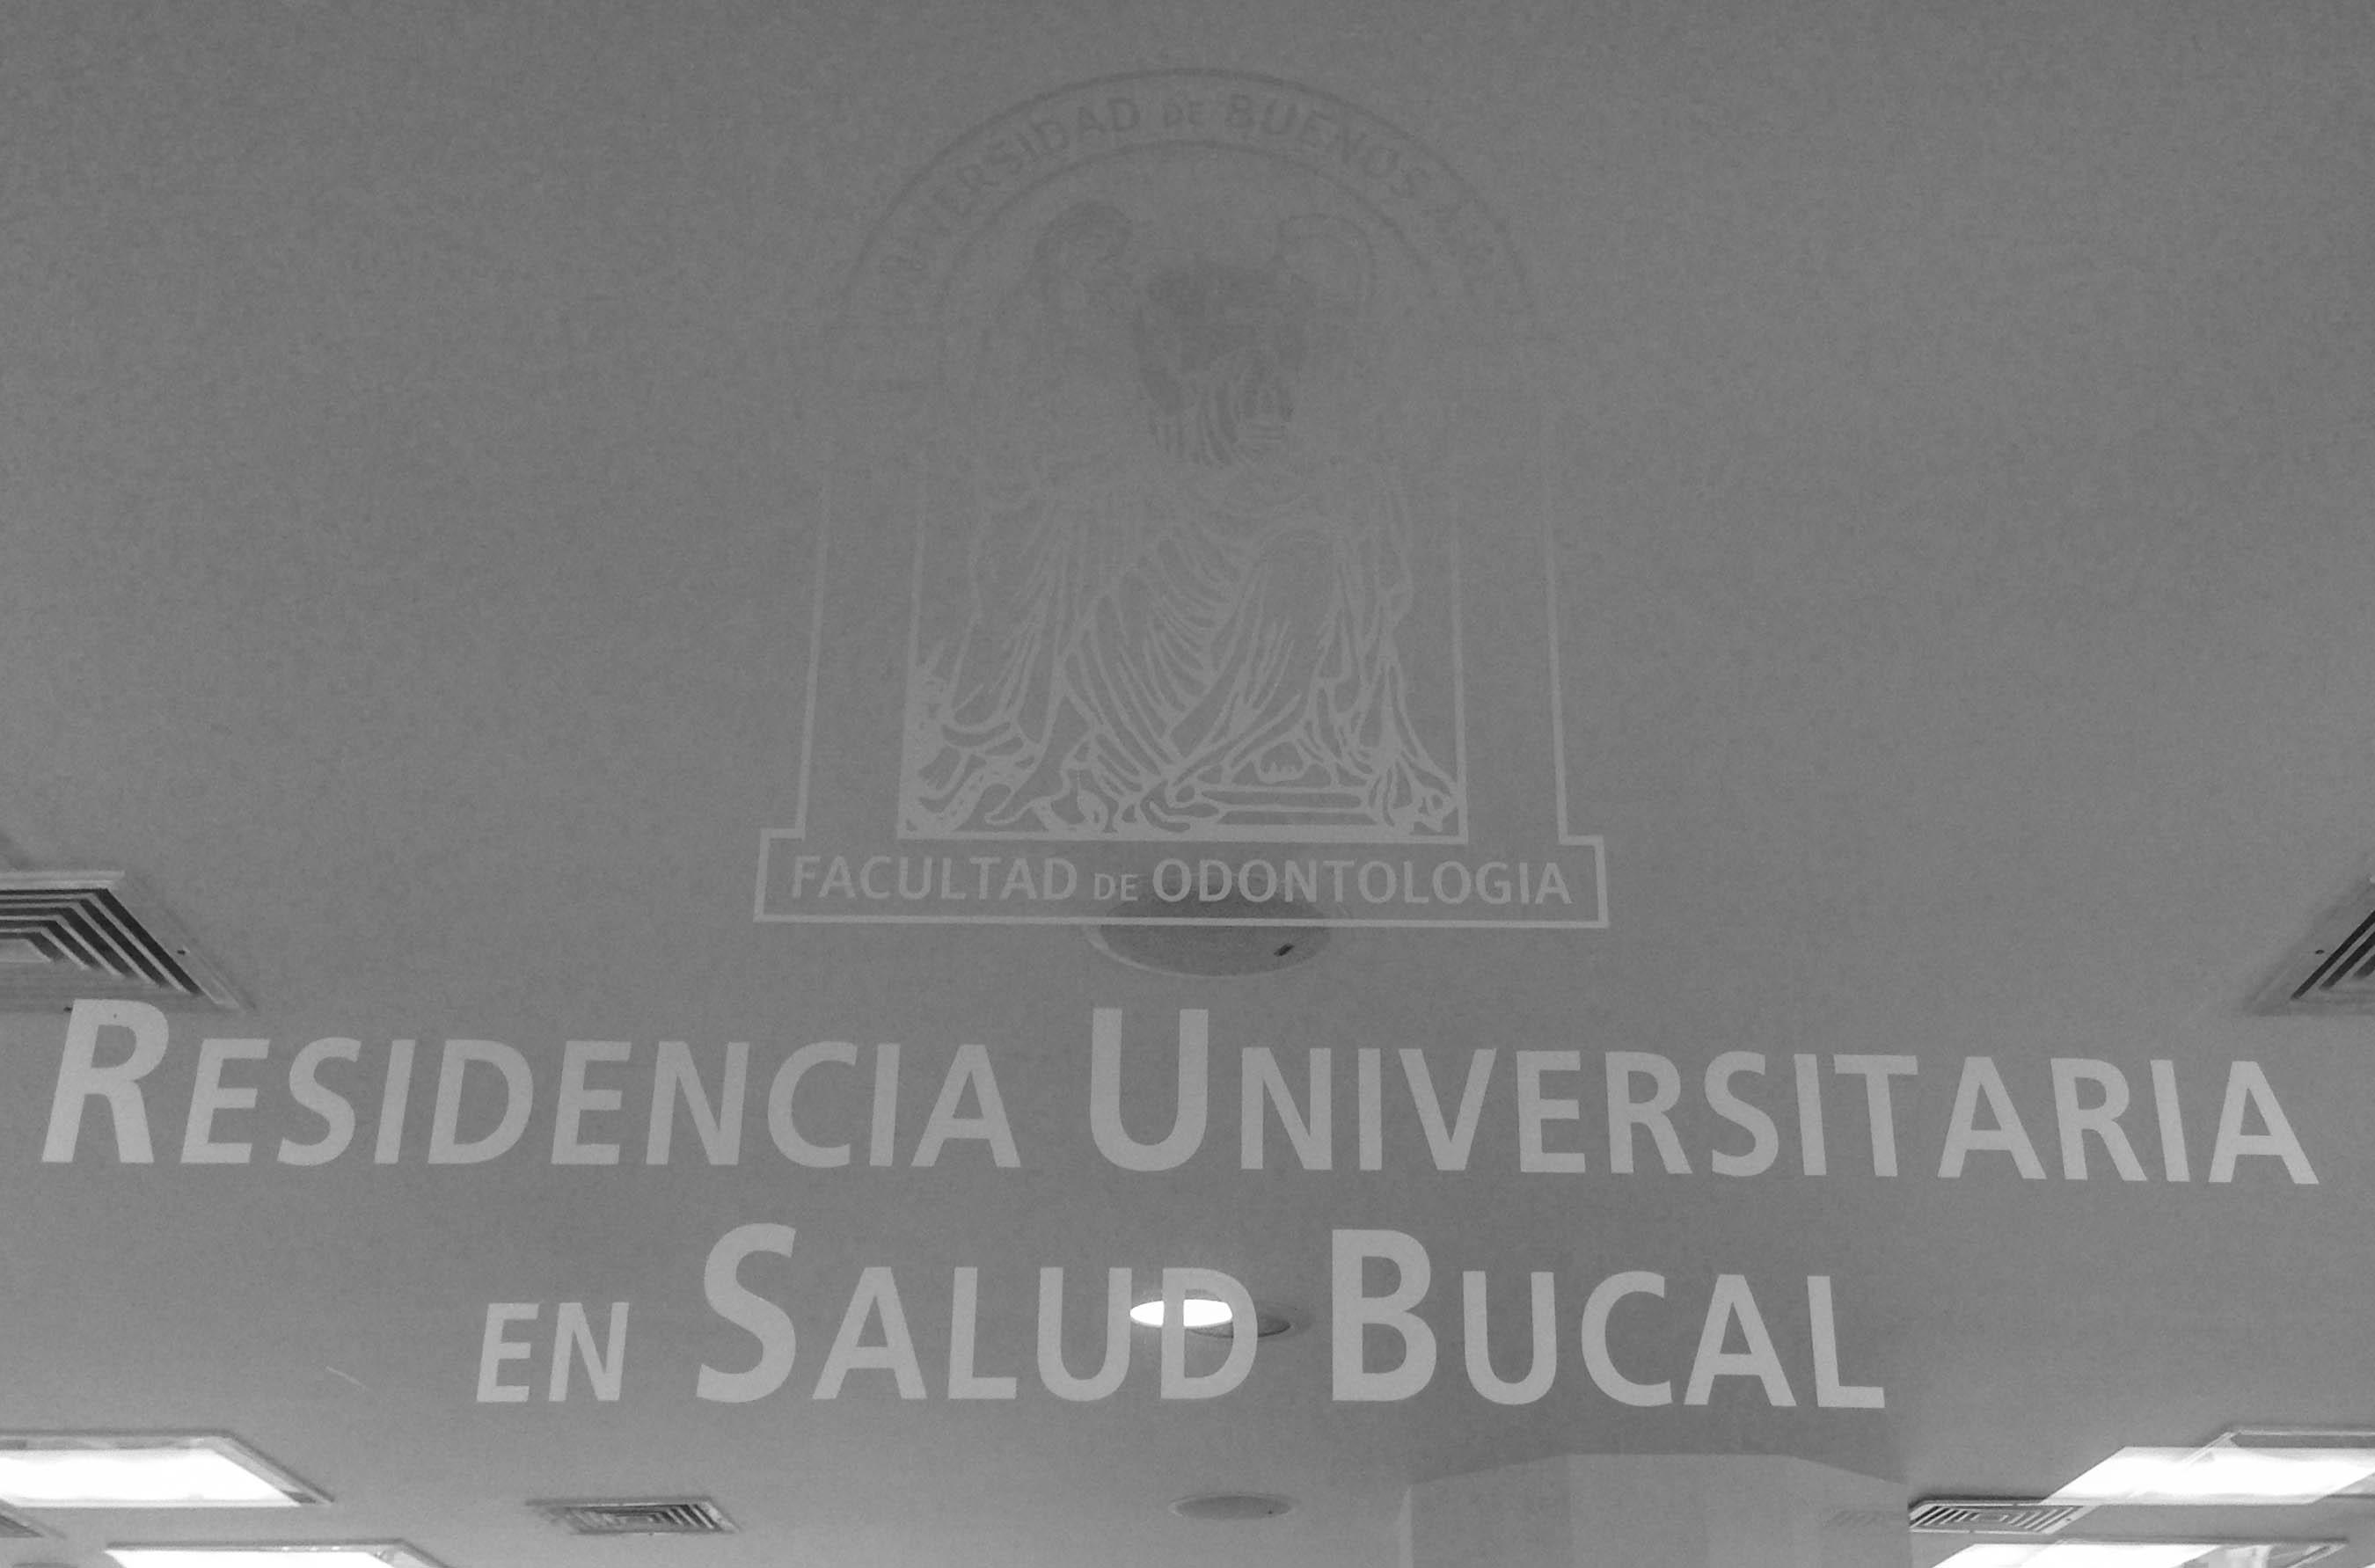 Residencia Universitaria en Salud Bucal 2017